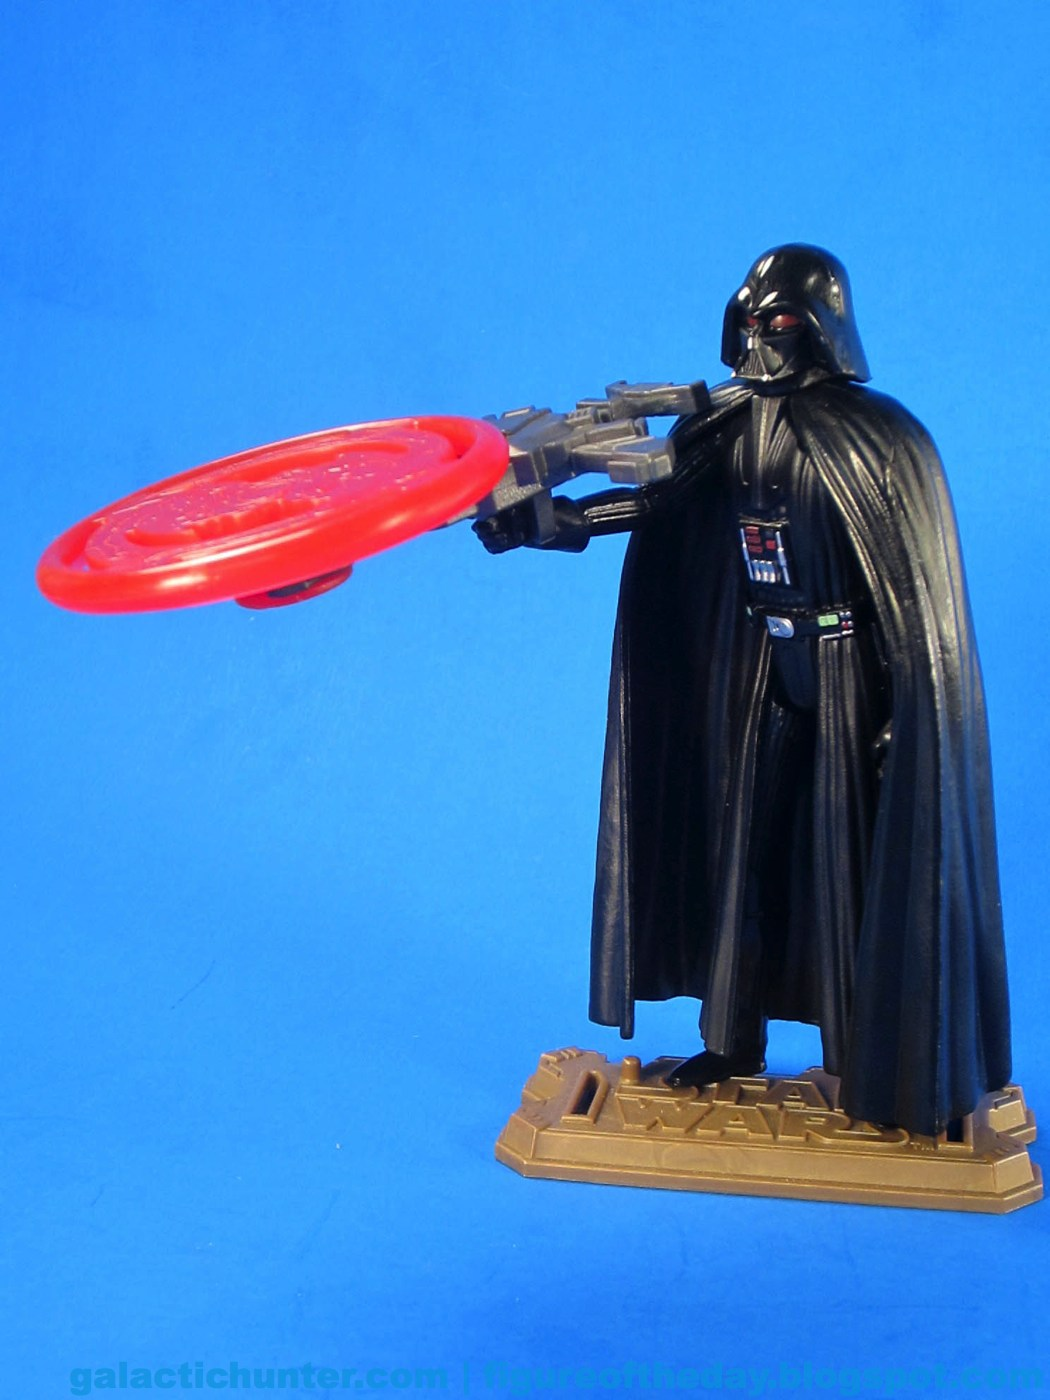 Galactic Hunteru0026#39;s Star Wars Figure of the Day with Adam Pawlus: Star Wars Figure of the Day: Day ...